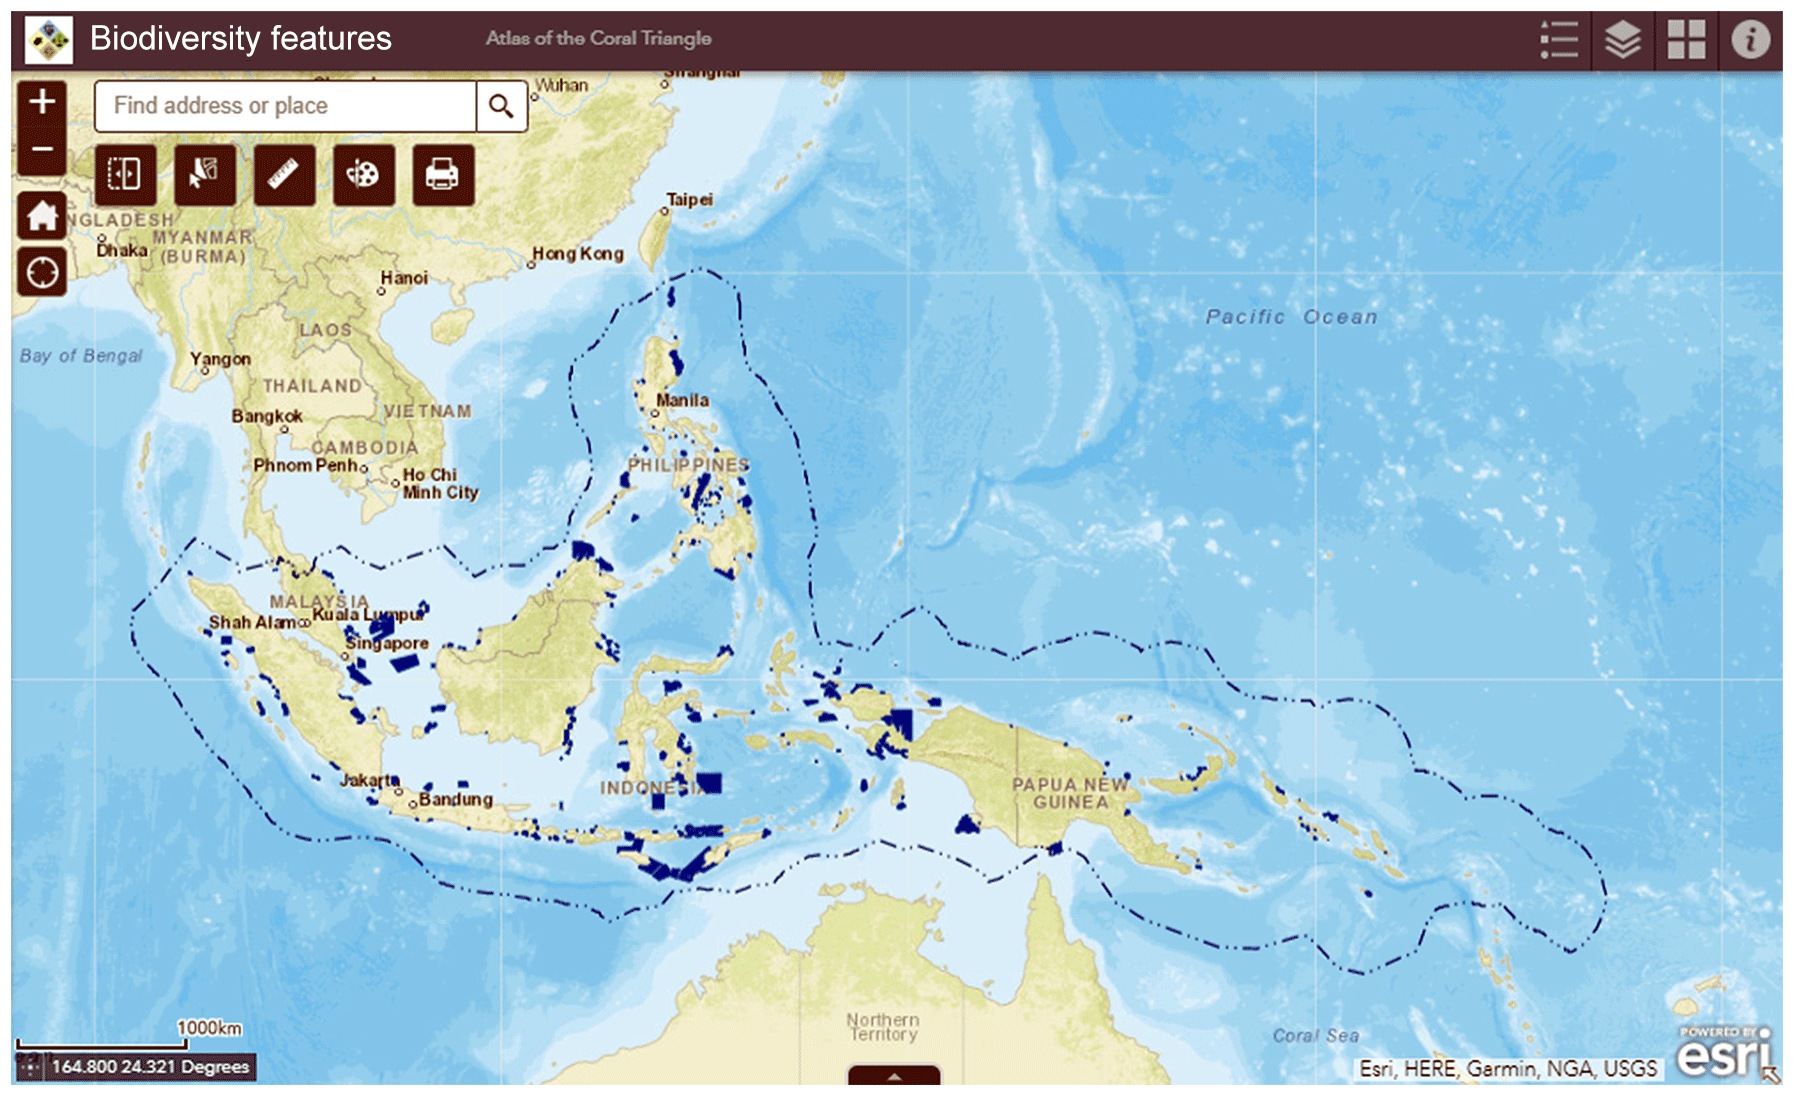 ESSD - An interactive atlas for marine biodiversity conservation in